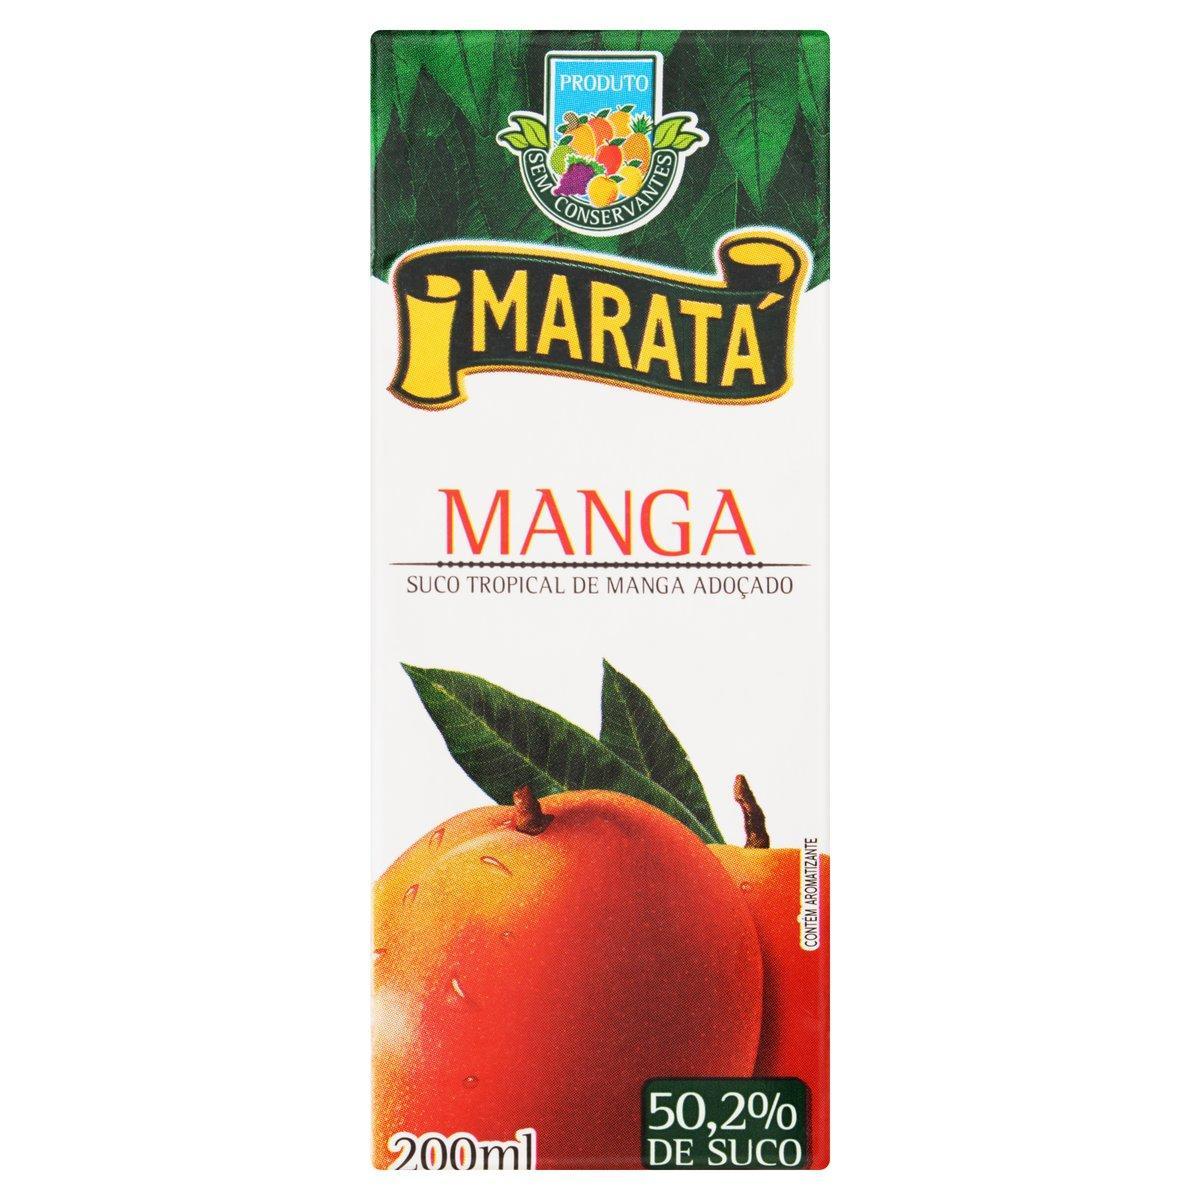 Néctar de Fruta sabor Manga 200ml Maratá tetra pak UN